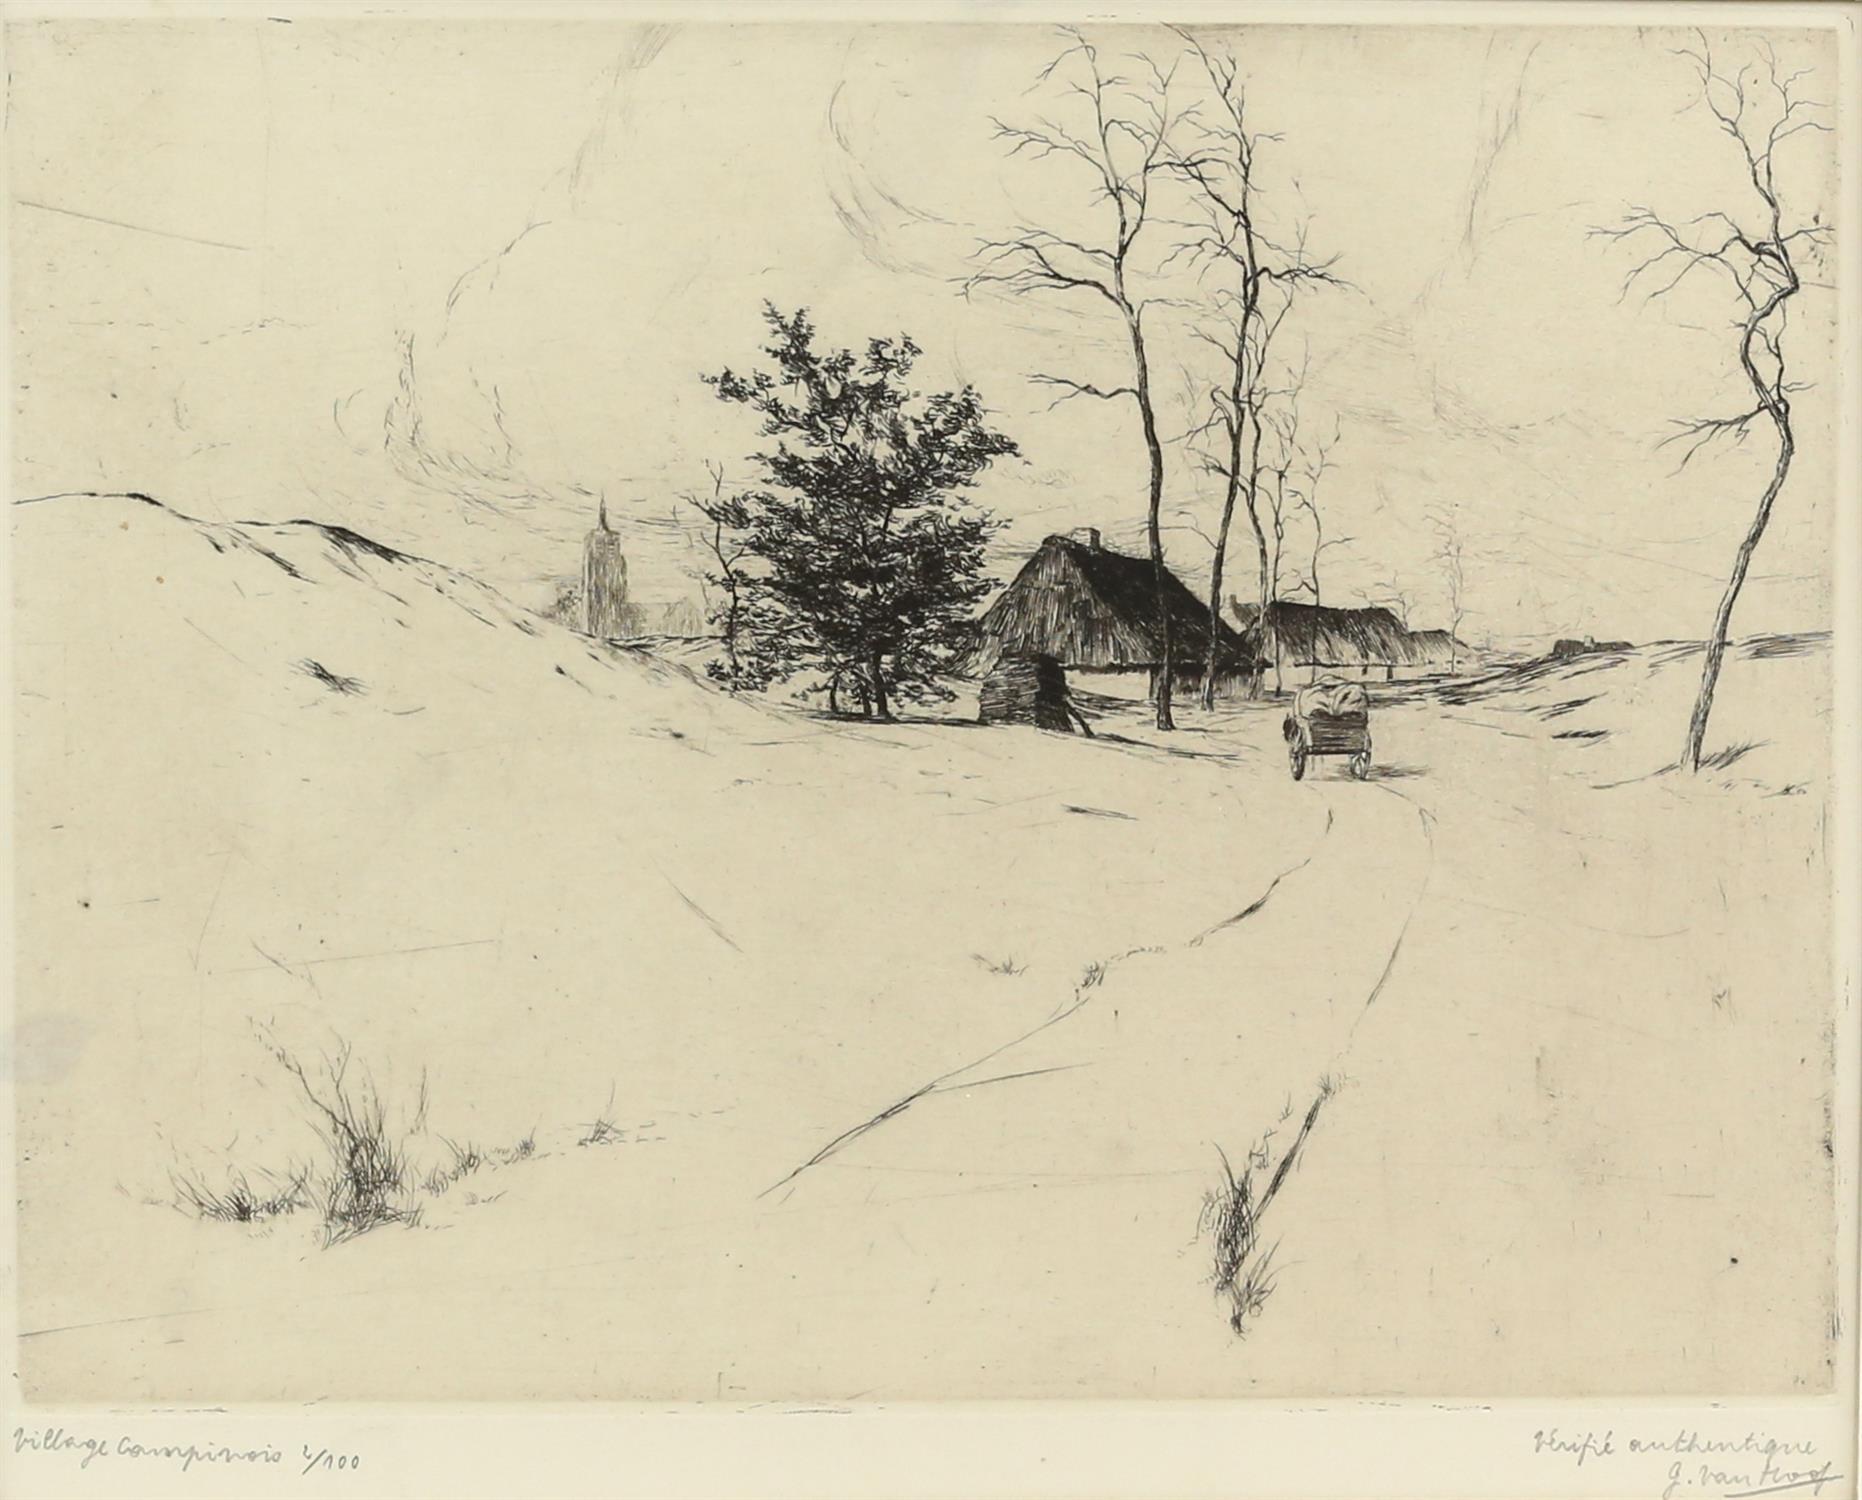 Jos van Hoof (Belgian, 1889-1937). 'Village Campinois', limited edition etching, signed,